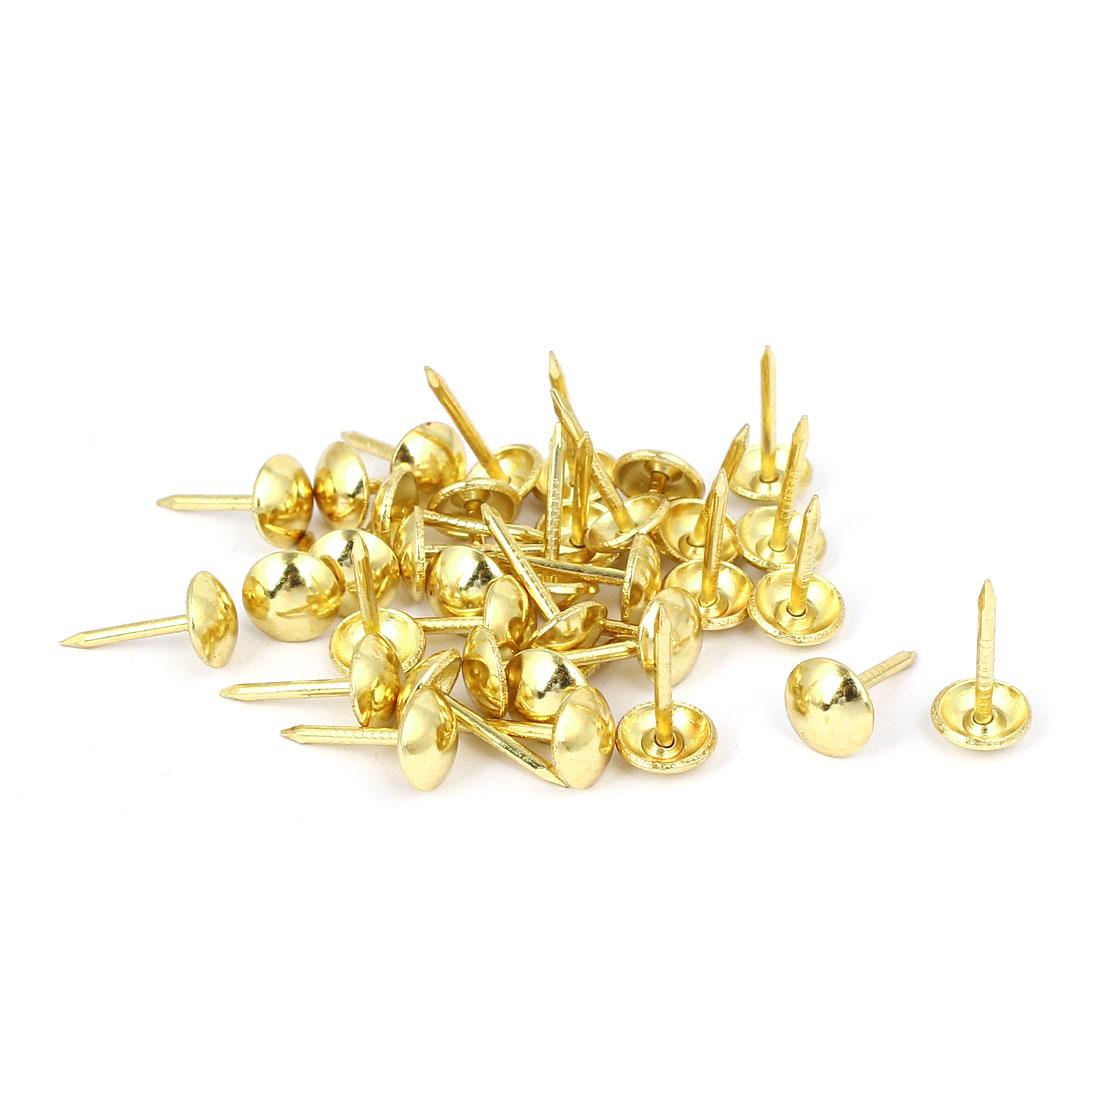 Home Furniture Upholstery Thumb Tack Nail Push Pin Gold Tone 8mm x 15mm 35pcs